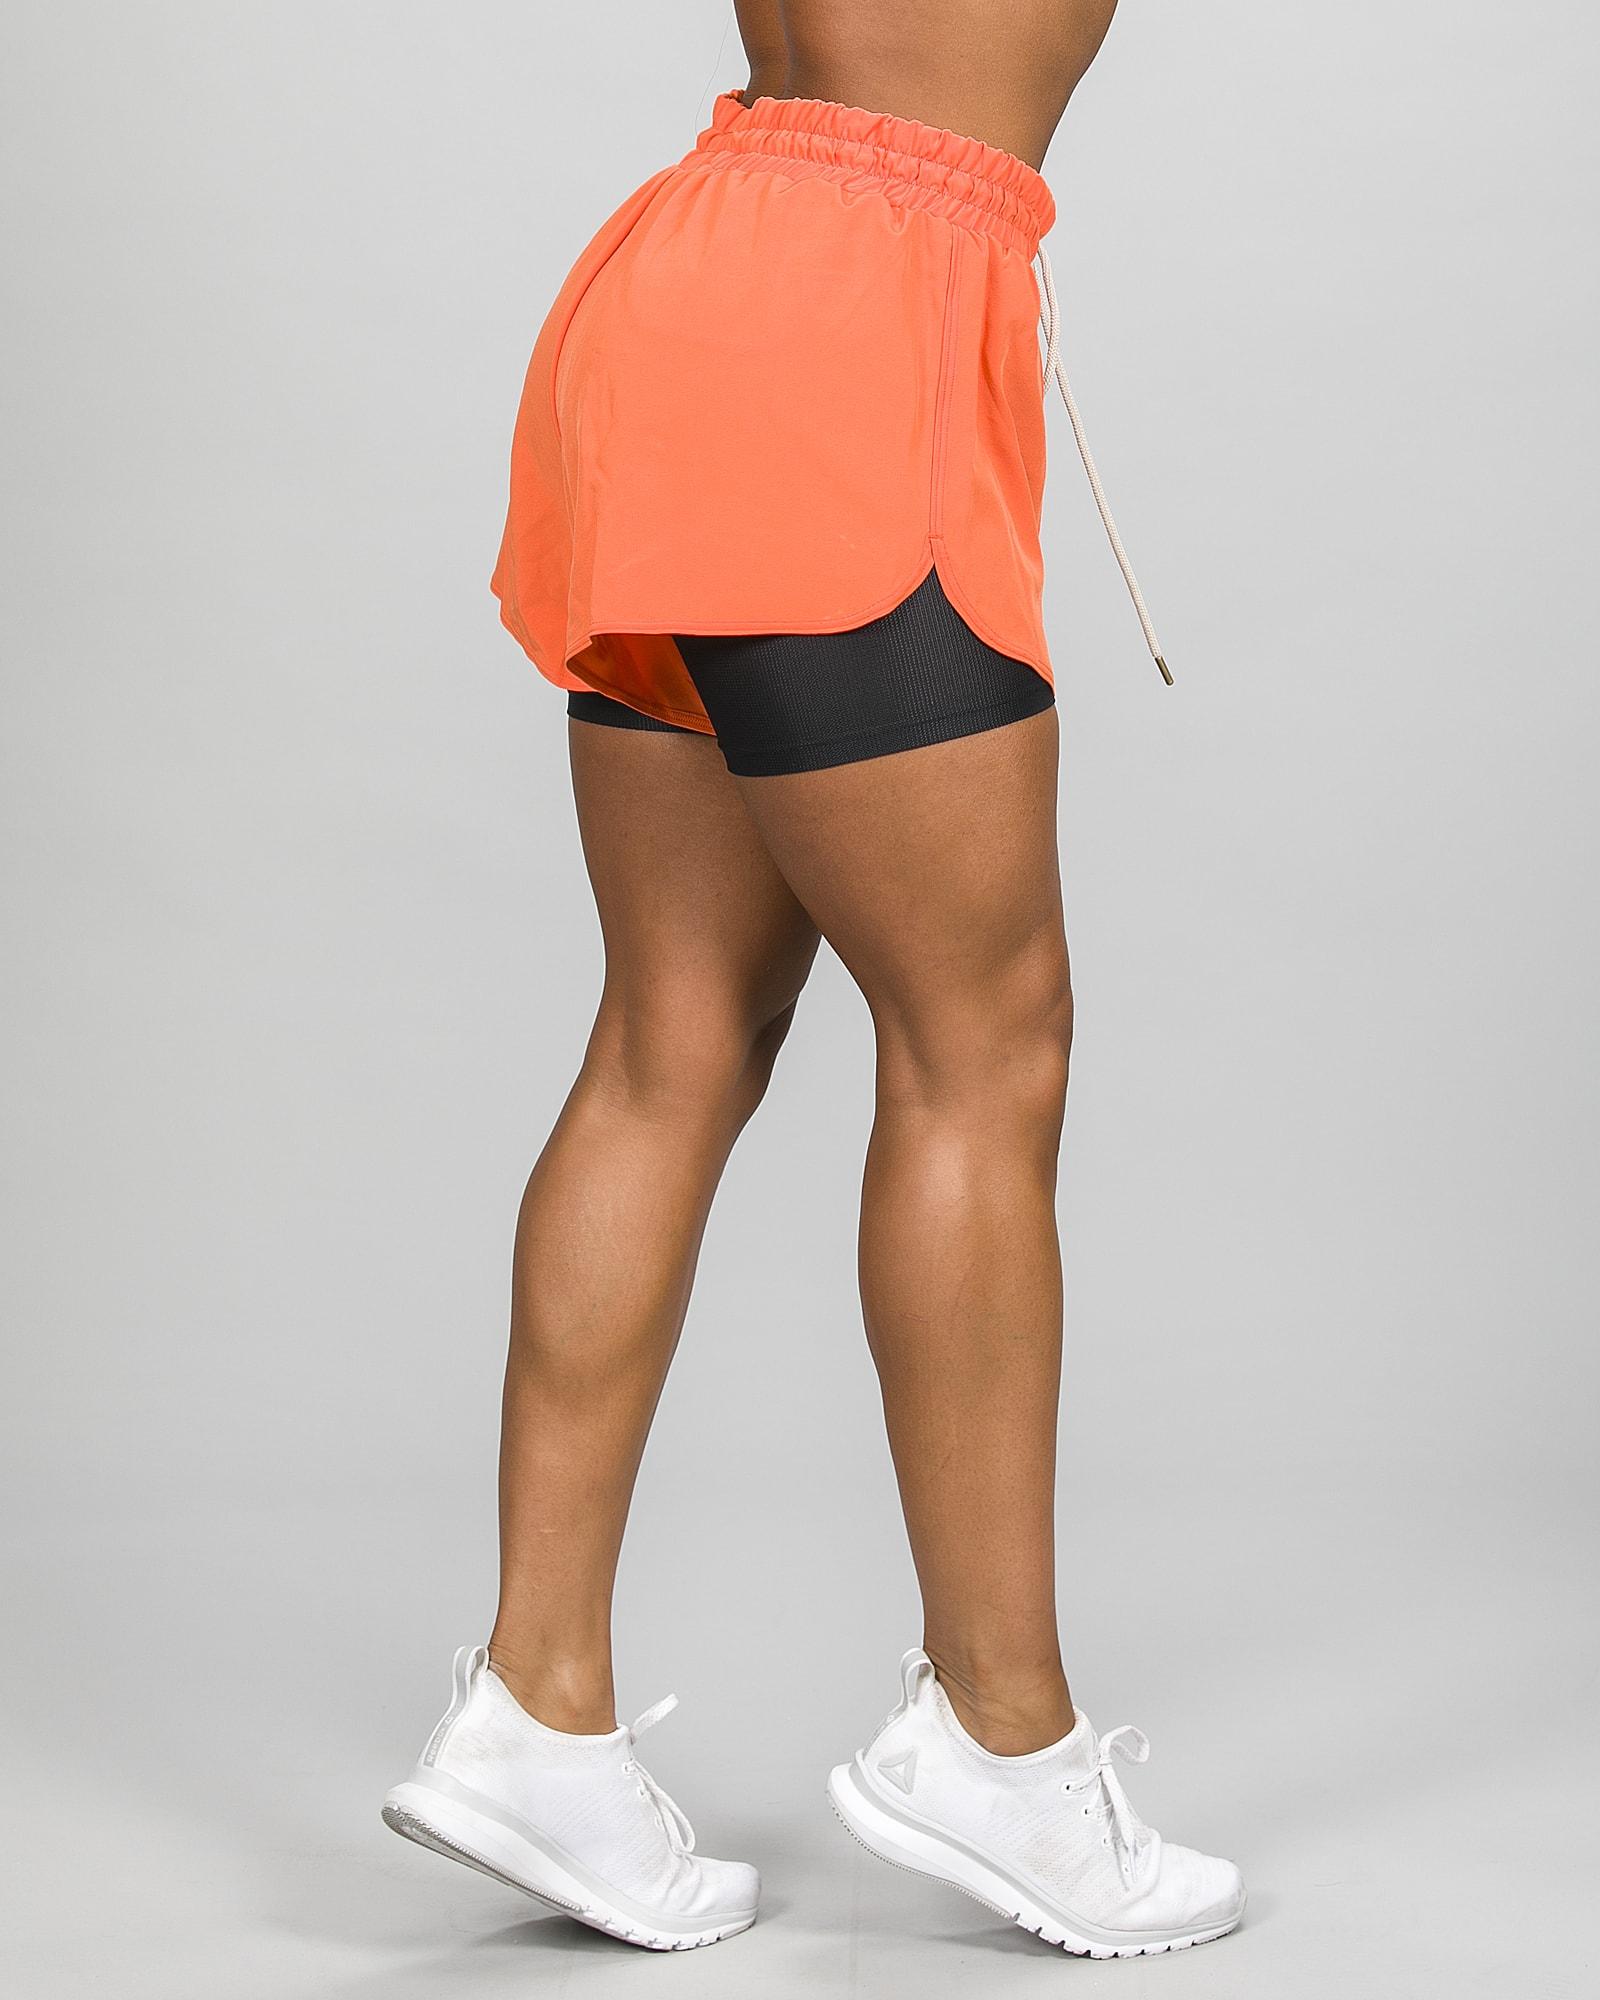 Skiny SK86 Shorts 083111- Blazing Orange e